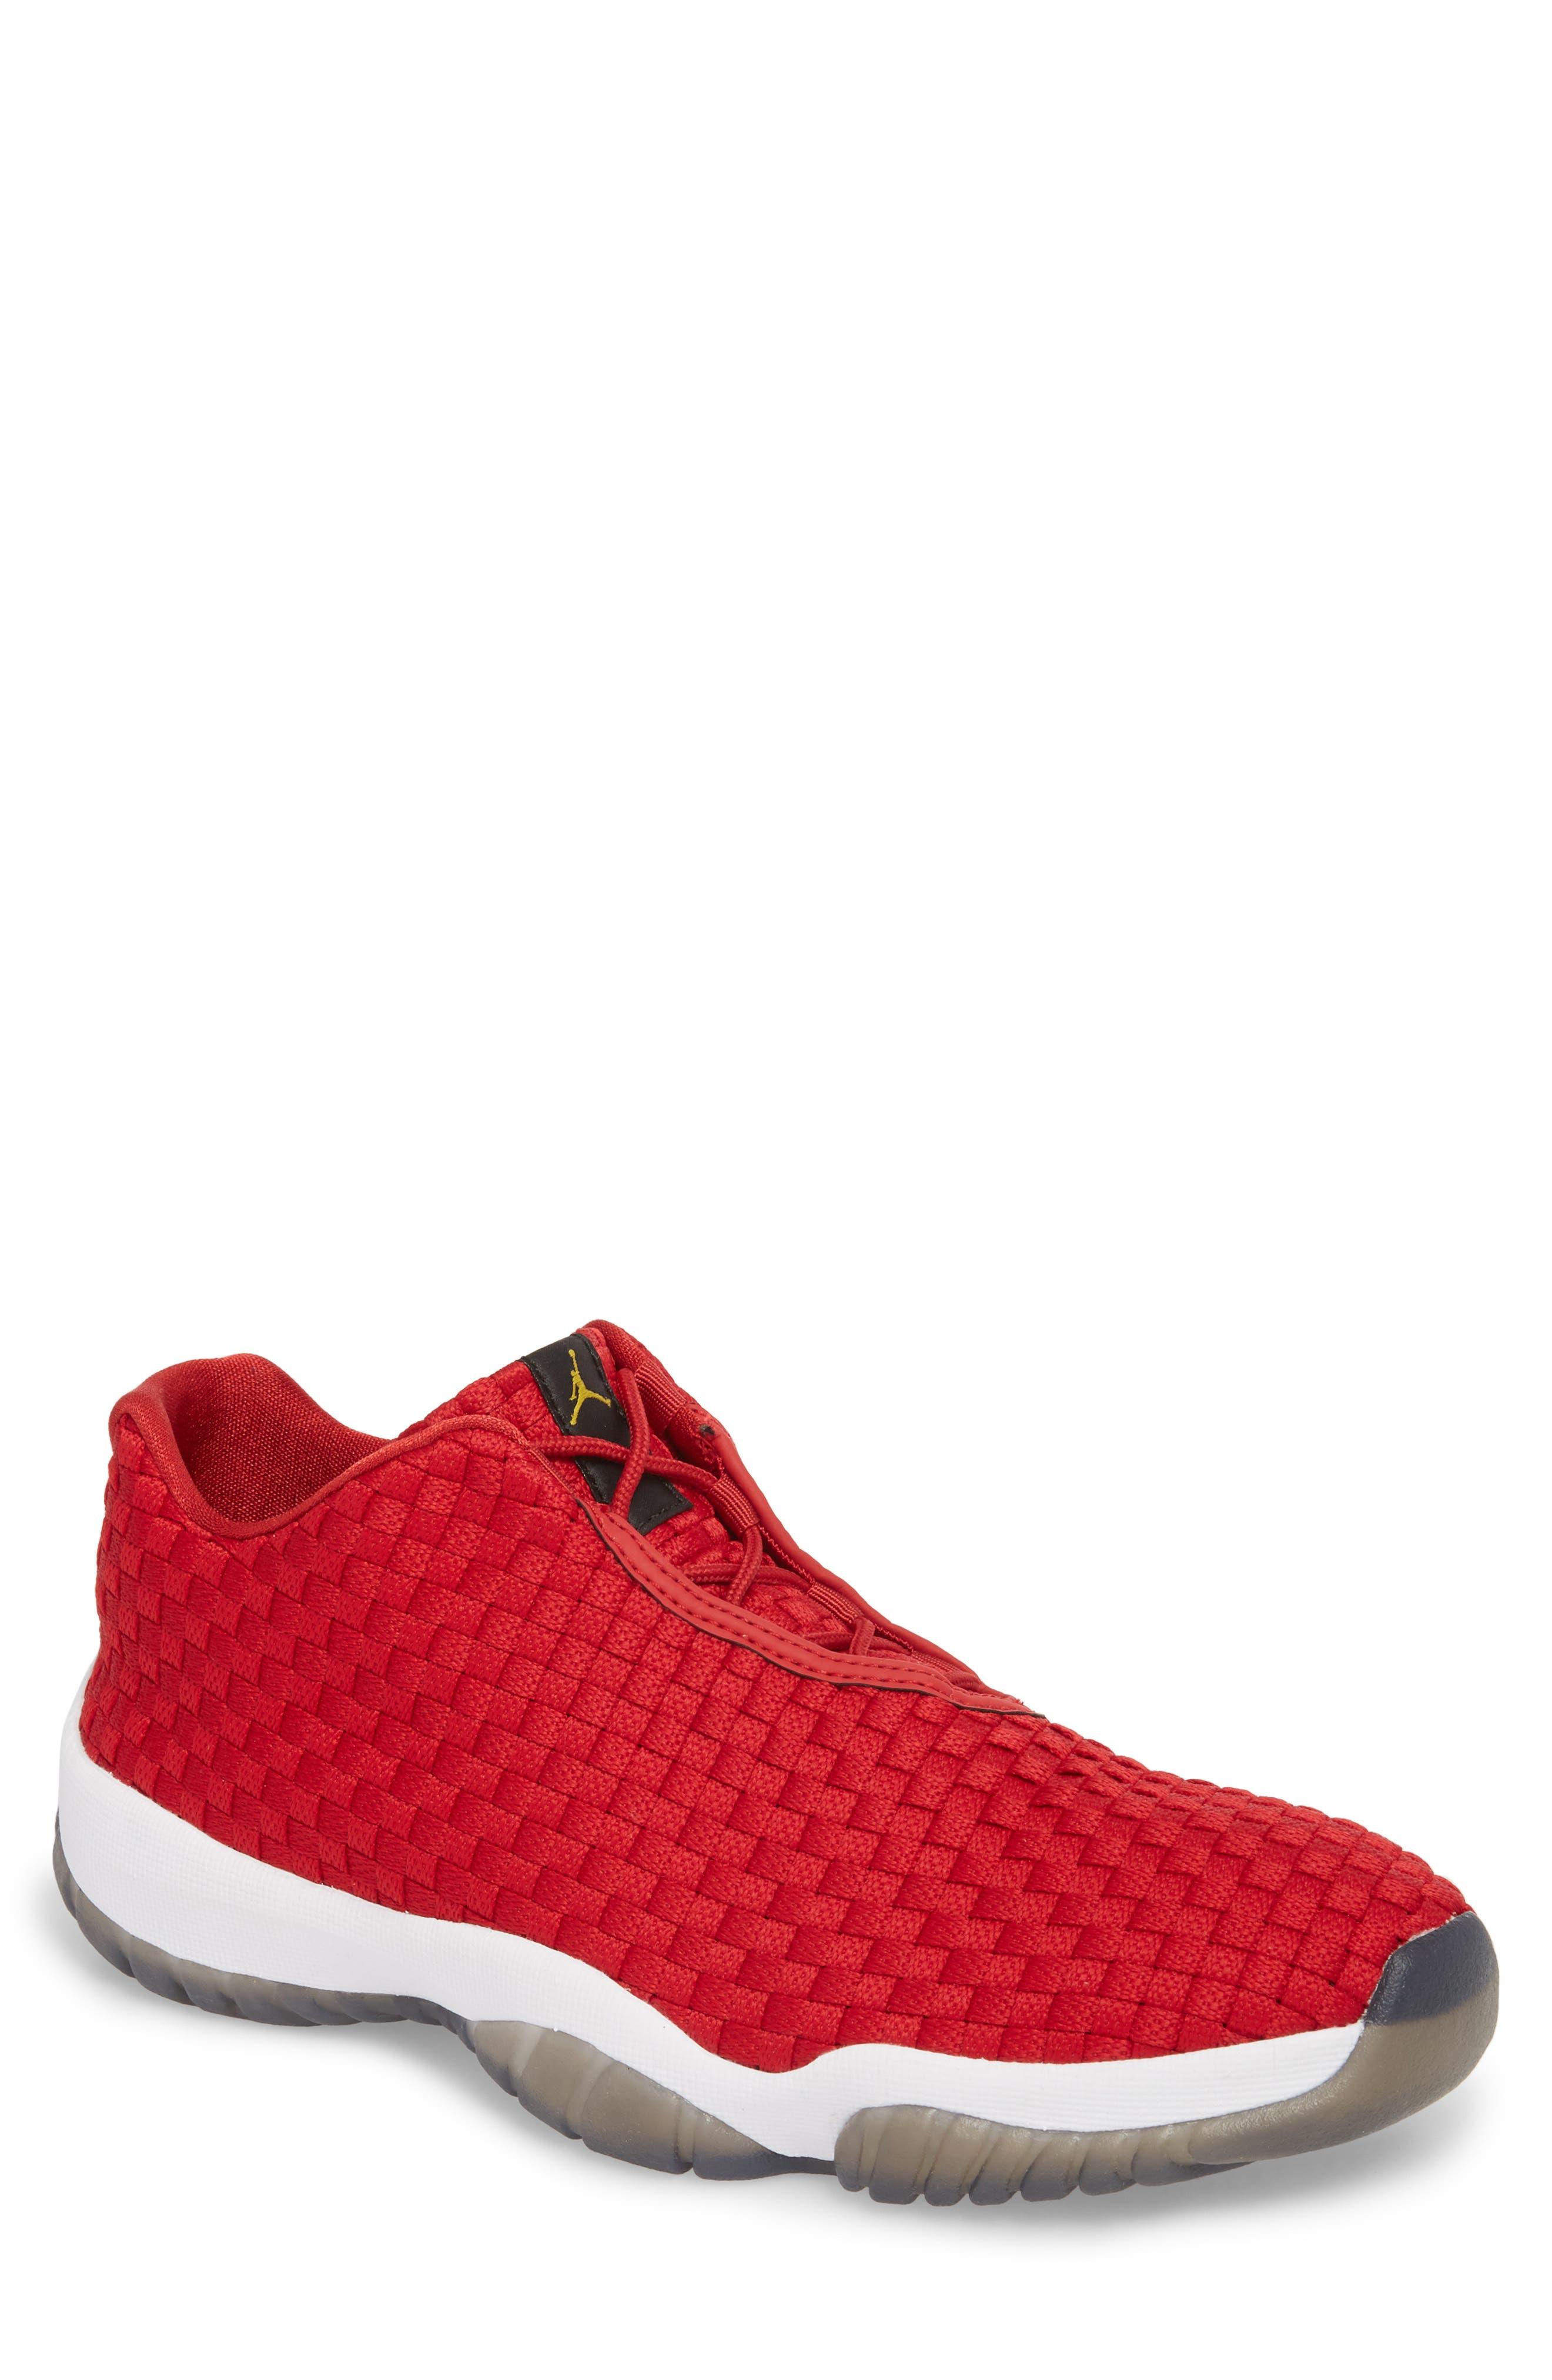 Air Jordan Future Woven Sneaker,                             Main thumbnail 1, color,                             Gym Red/ White/ Black